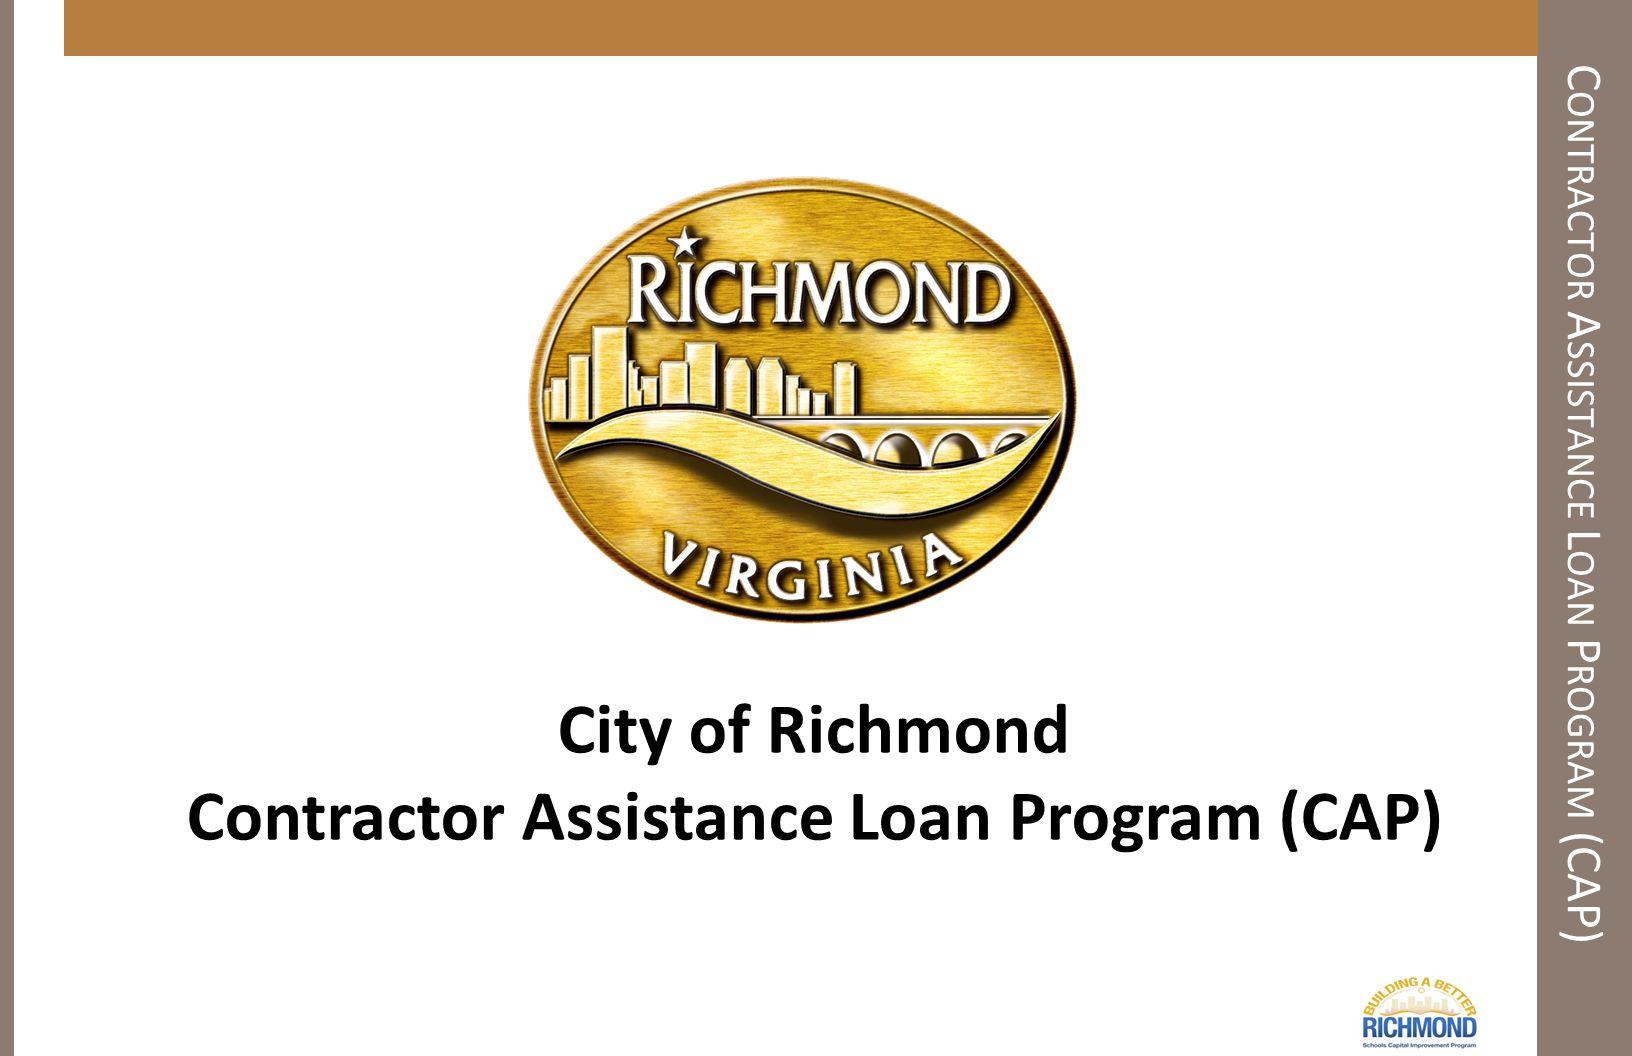 C ONTRACTOR A SSISTANCE L OAN P ROGRAM (CAP) City of Richmond Contractor Assistance Loan Program (CAP)